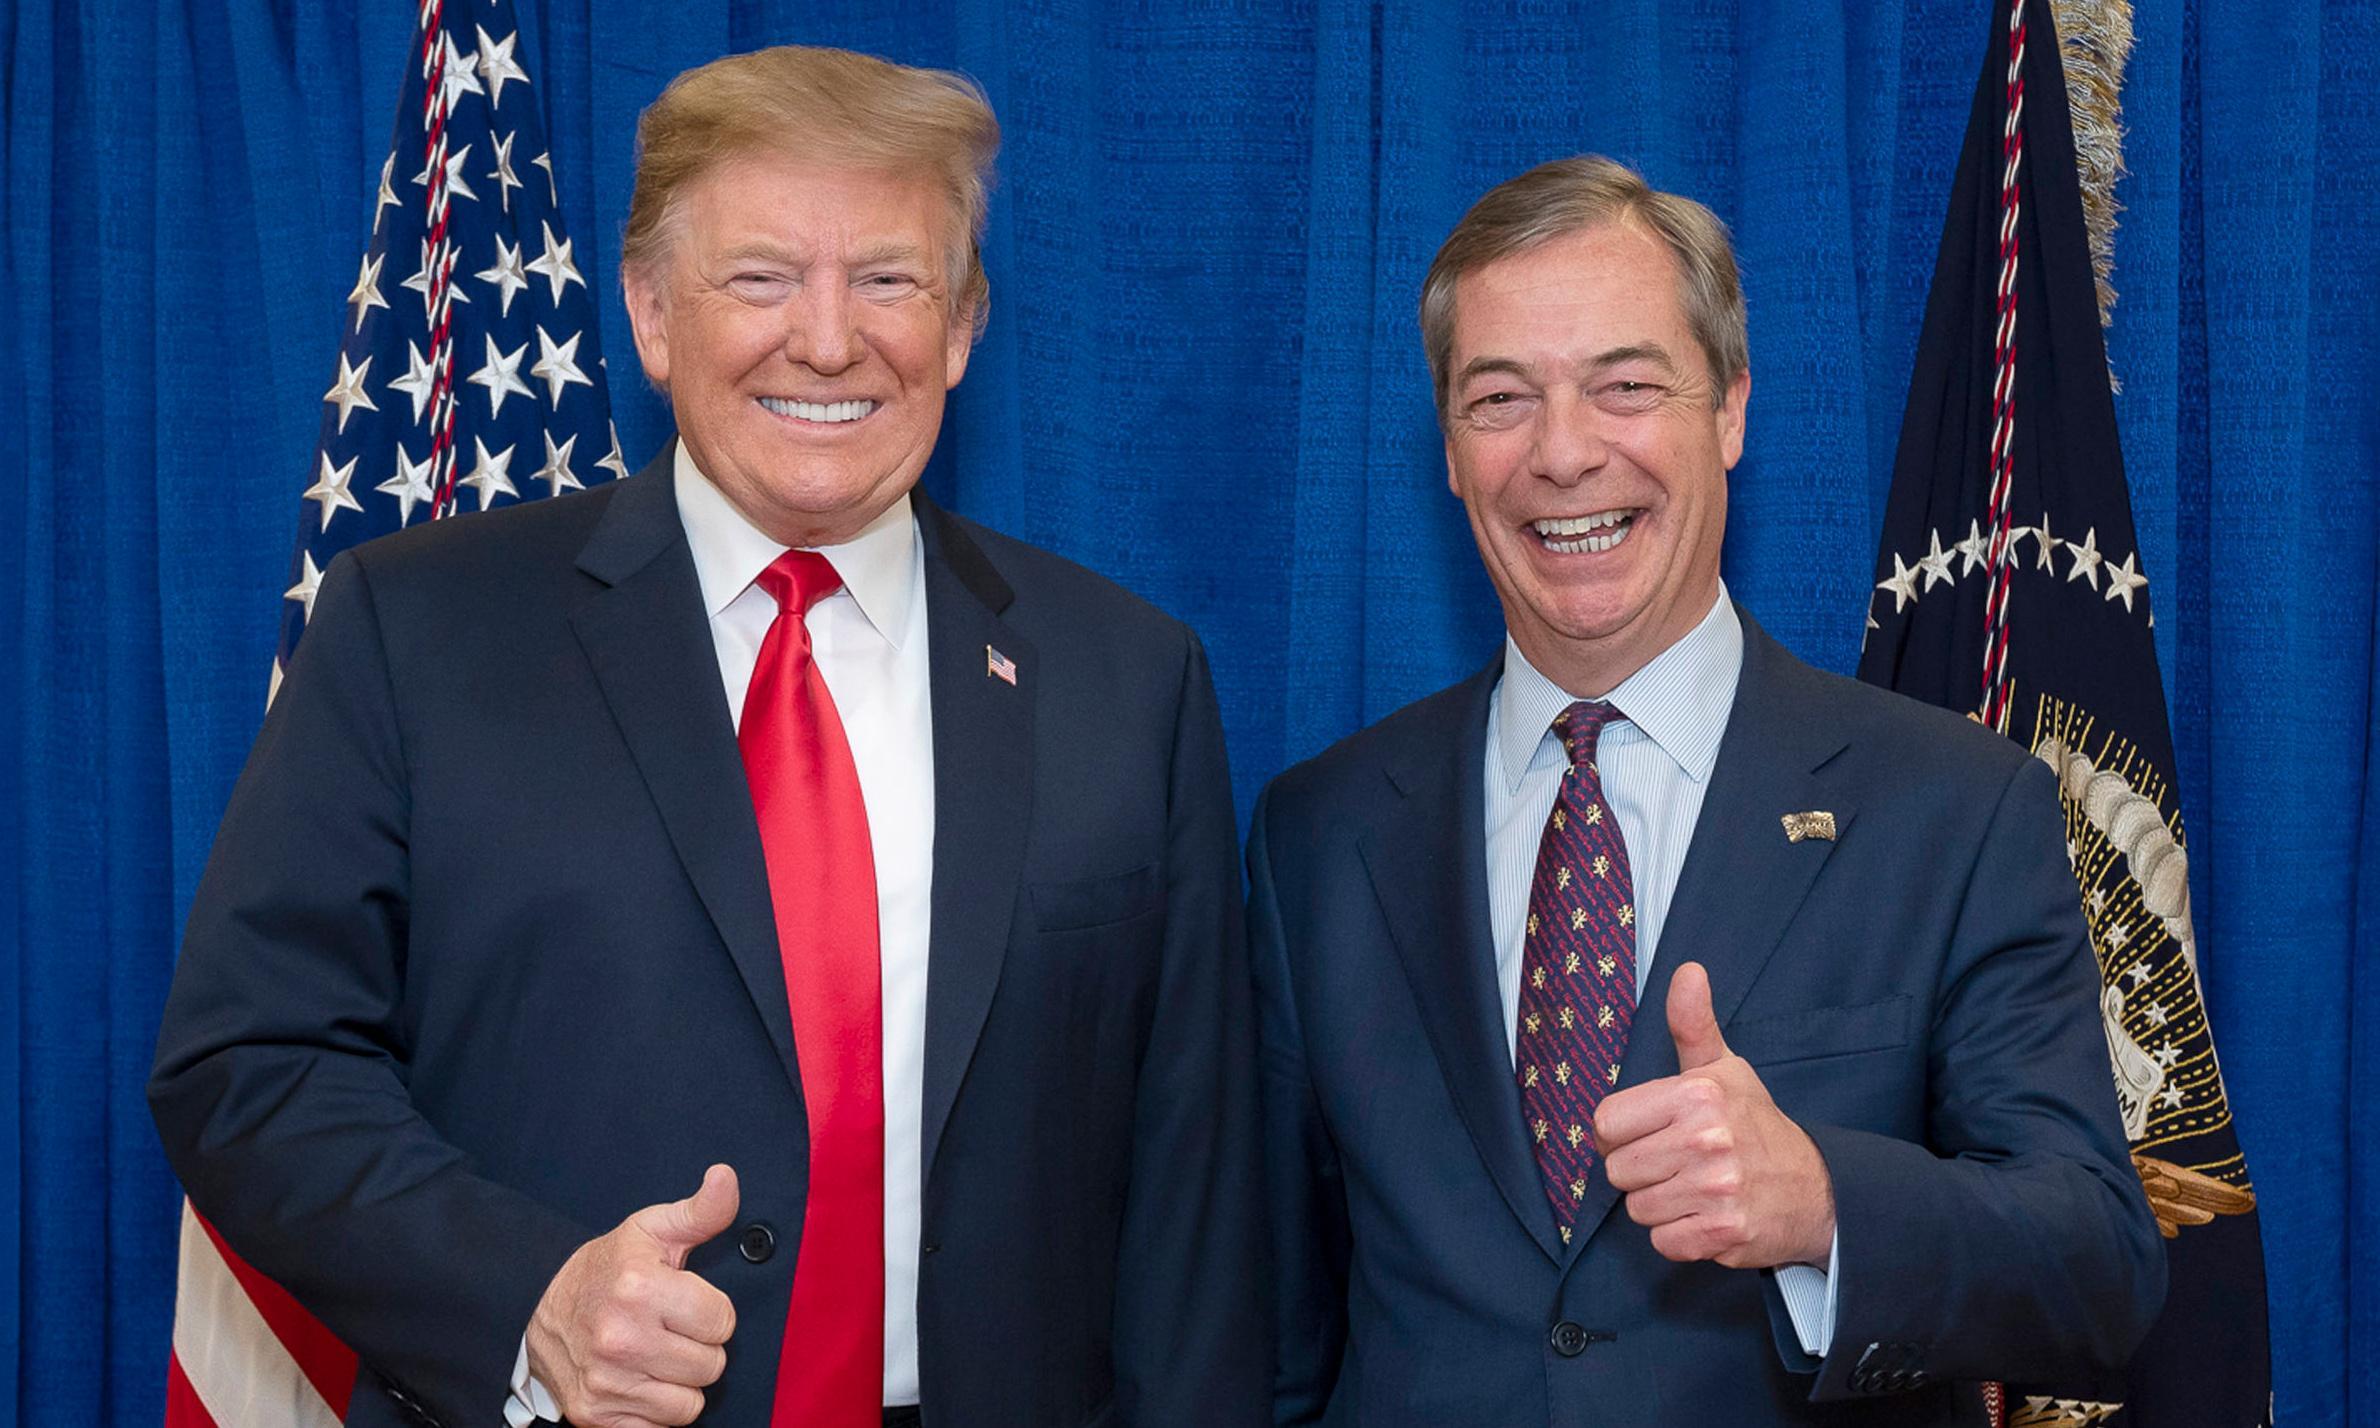 Donald Trump's 'go back' comments were 'genius', says Nigel Farage